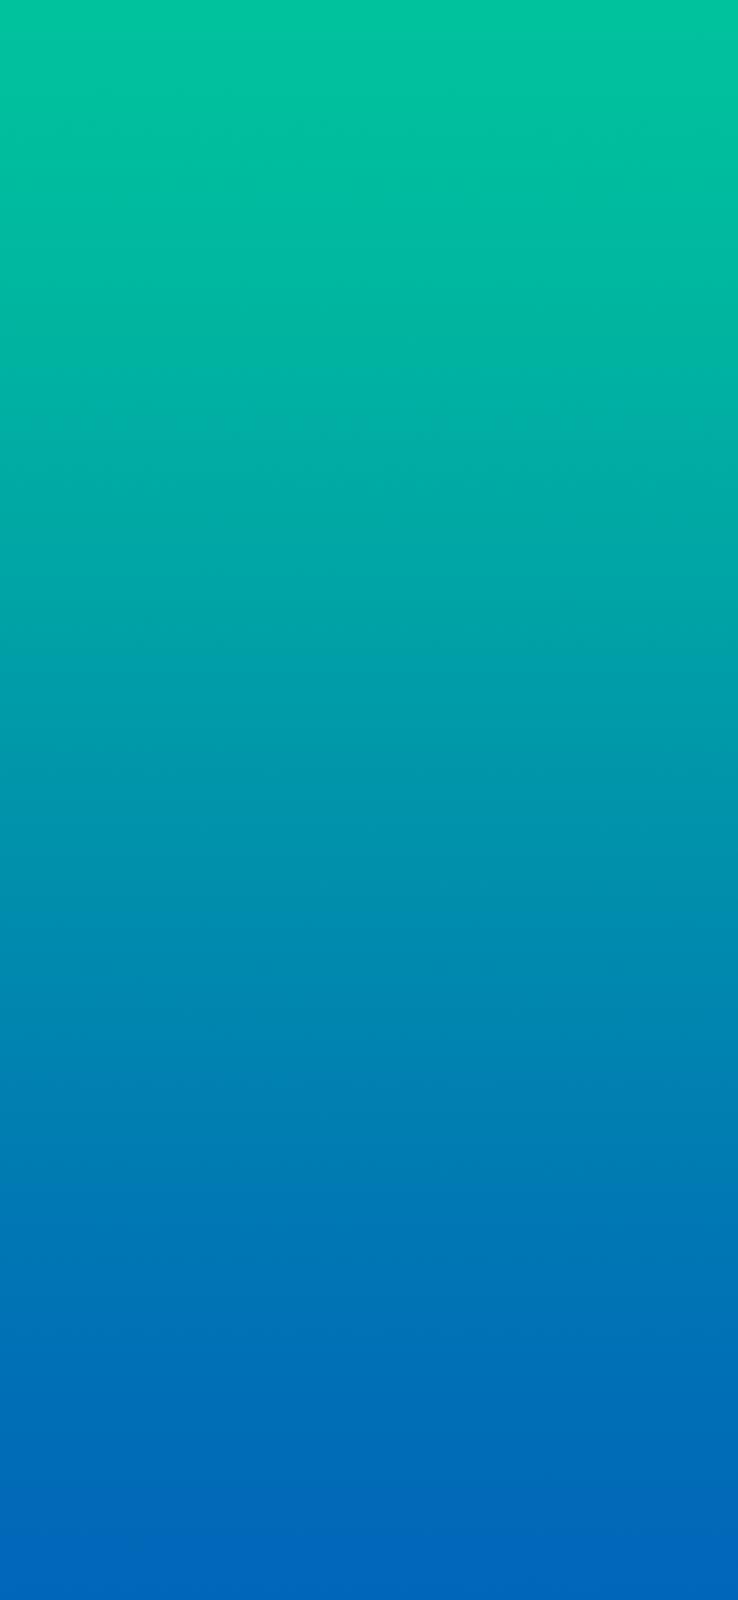 Vivo V11 Pro Stock Wallpapers (12 wallpapers) | om | Blue art, Solid